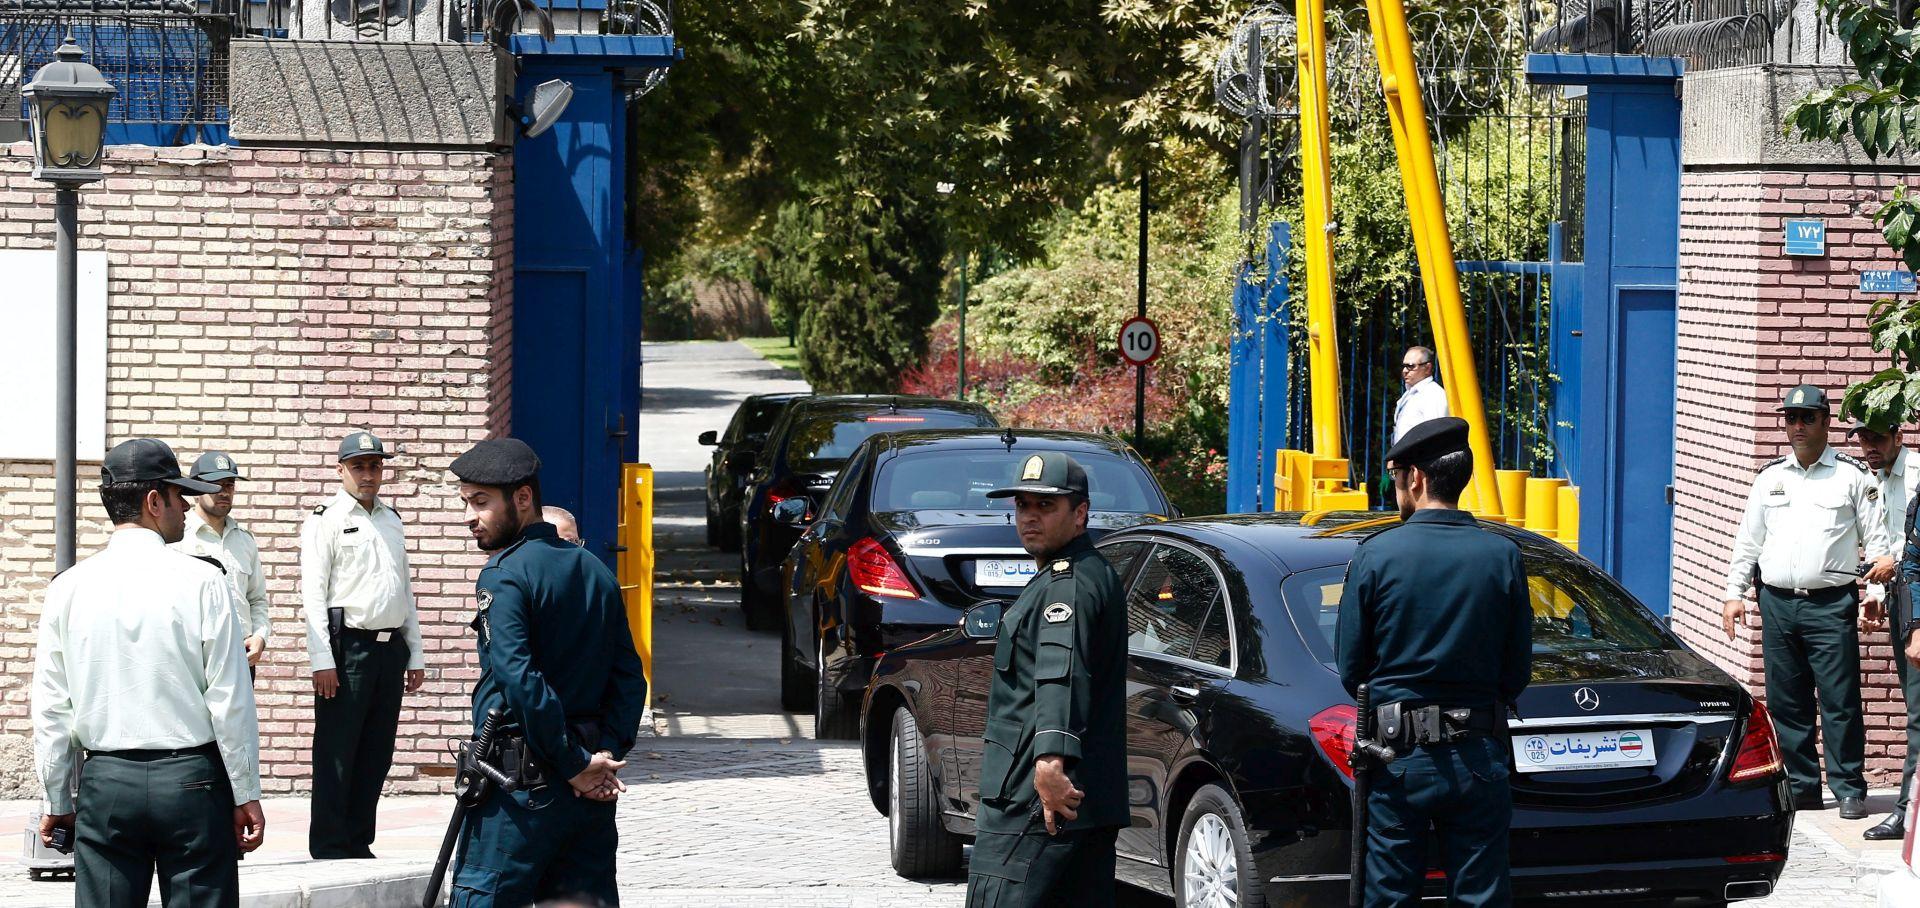 NAKON ČETIRI GODINE Hammond u Teheranu ponovno otvorio britansko veleposlanstvo